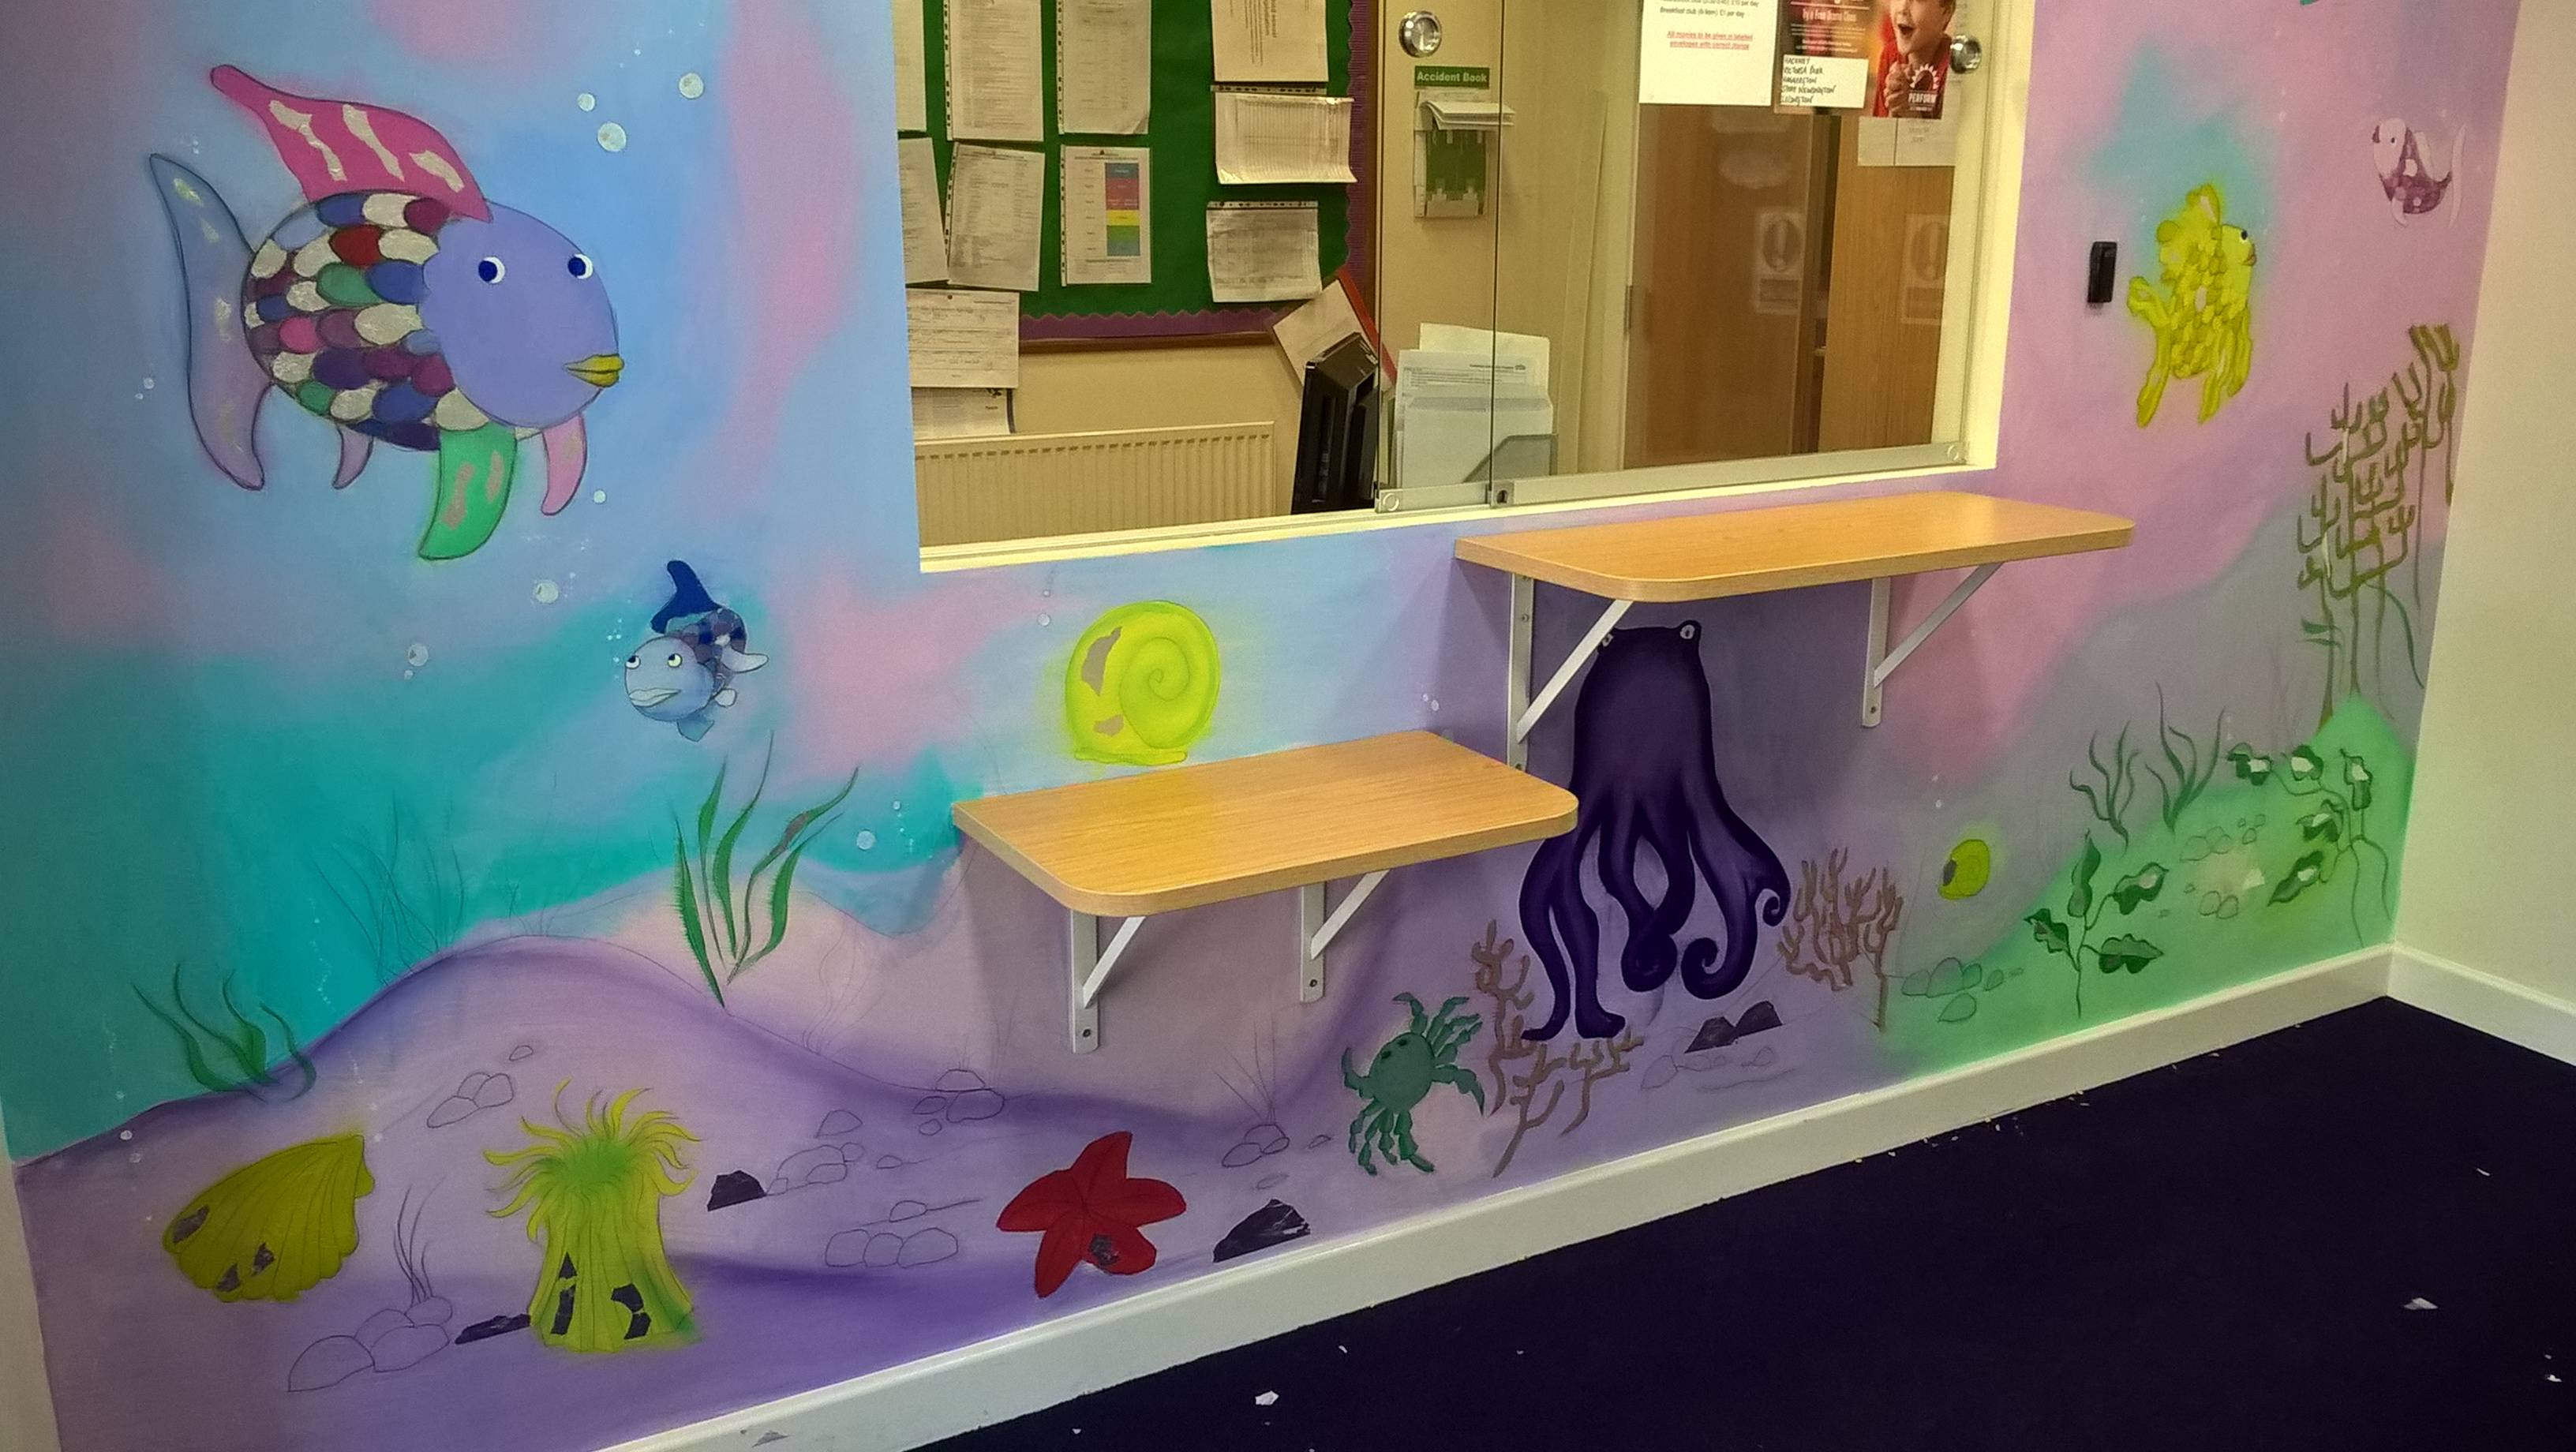 Office reception area. Rainbow fish